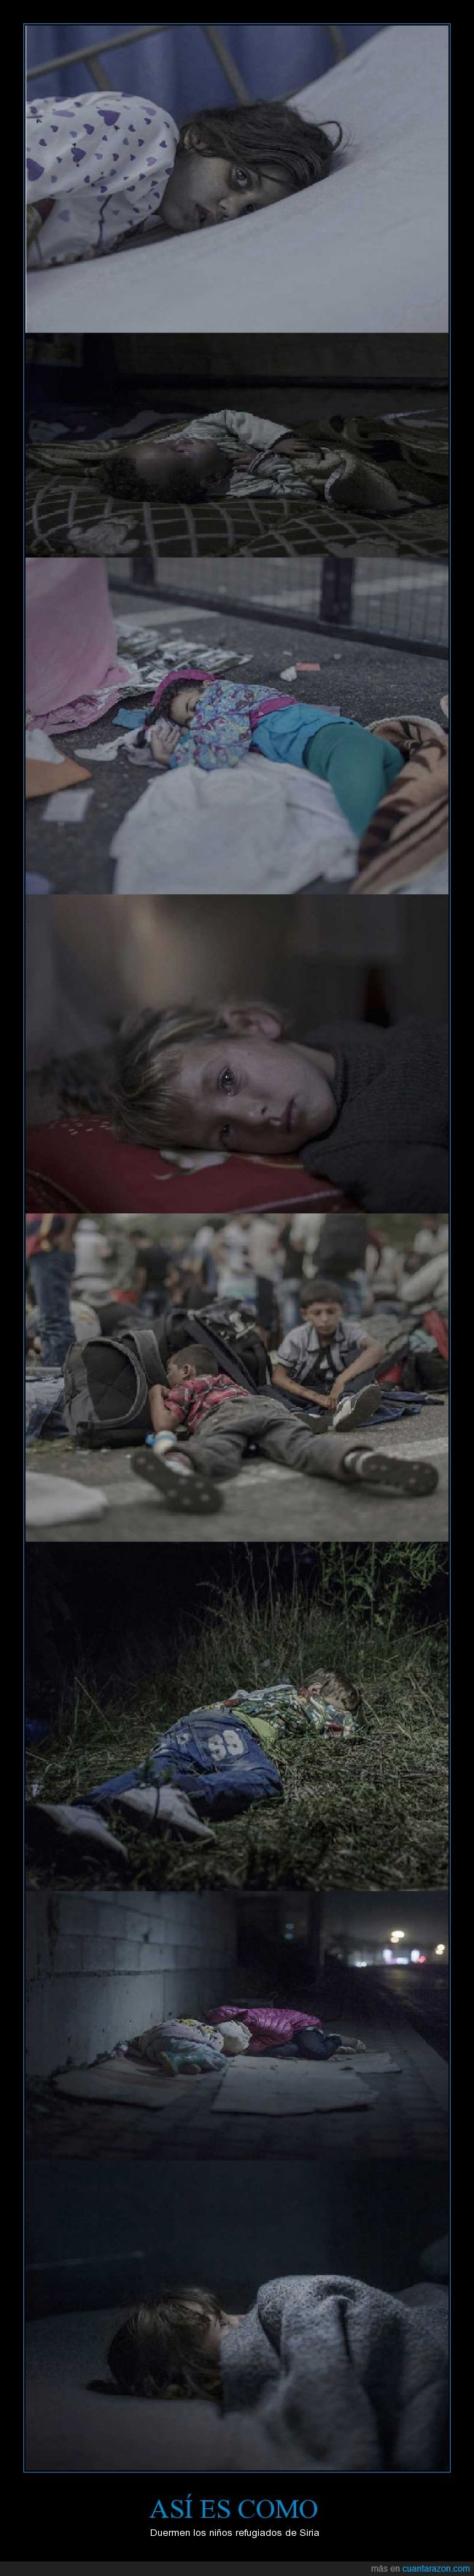 dormir,guerra,niños,refugiados,siria,tristeza